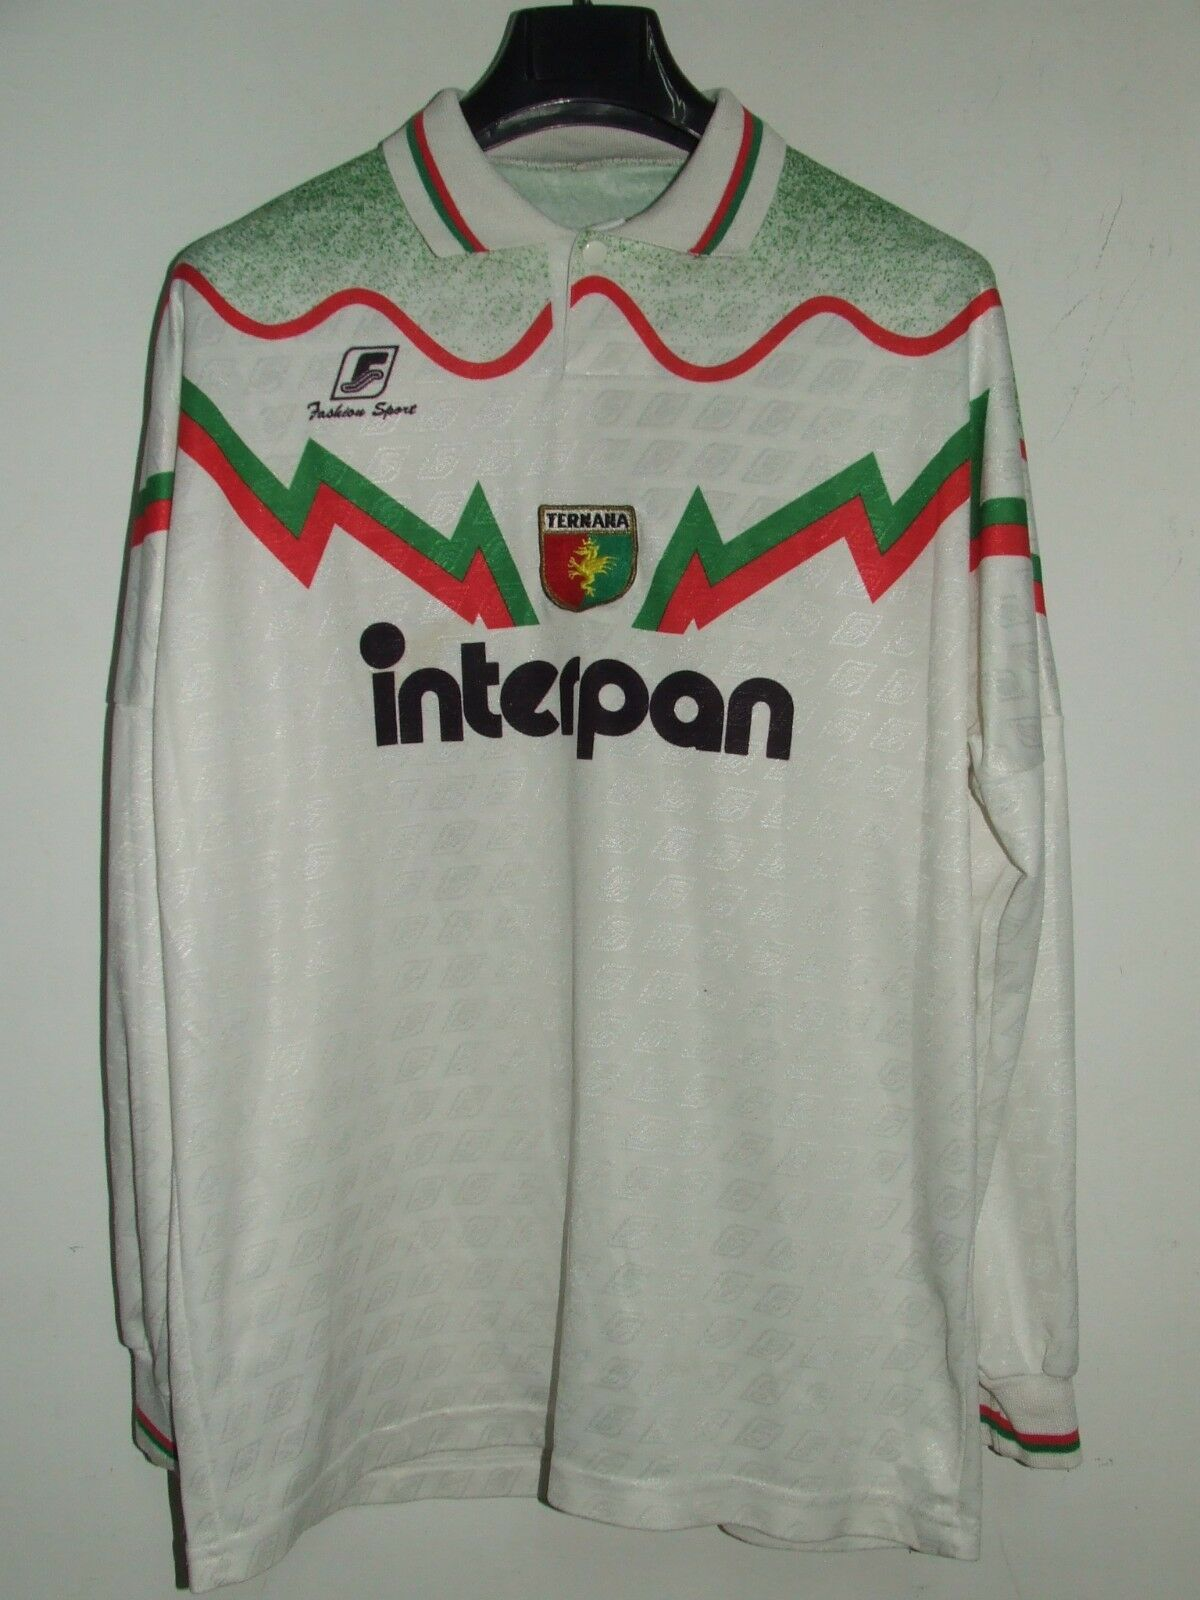 Fußballtrikot TRIKOT matchworn MAILLOT CAMISETA matchworn TRIKOT Ternana Calcio Nr11 90'S f56908